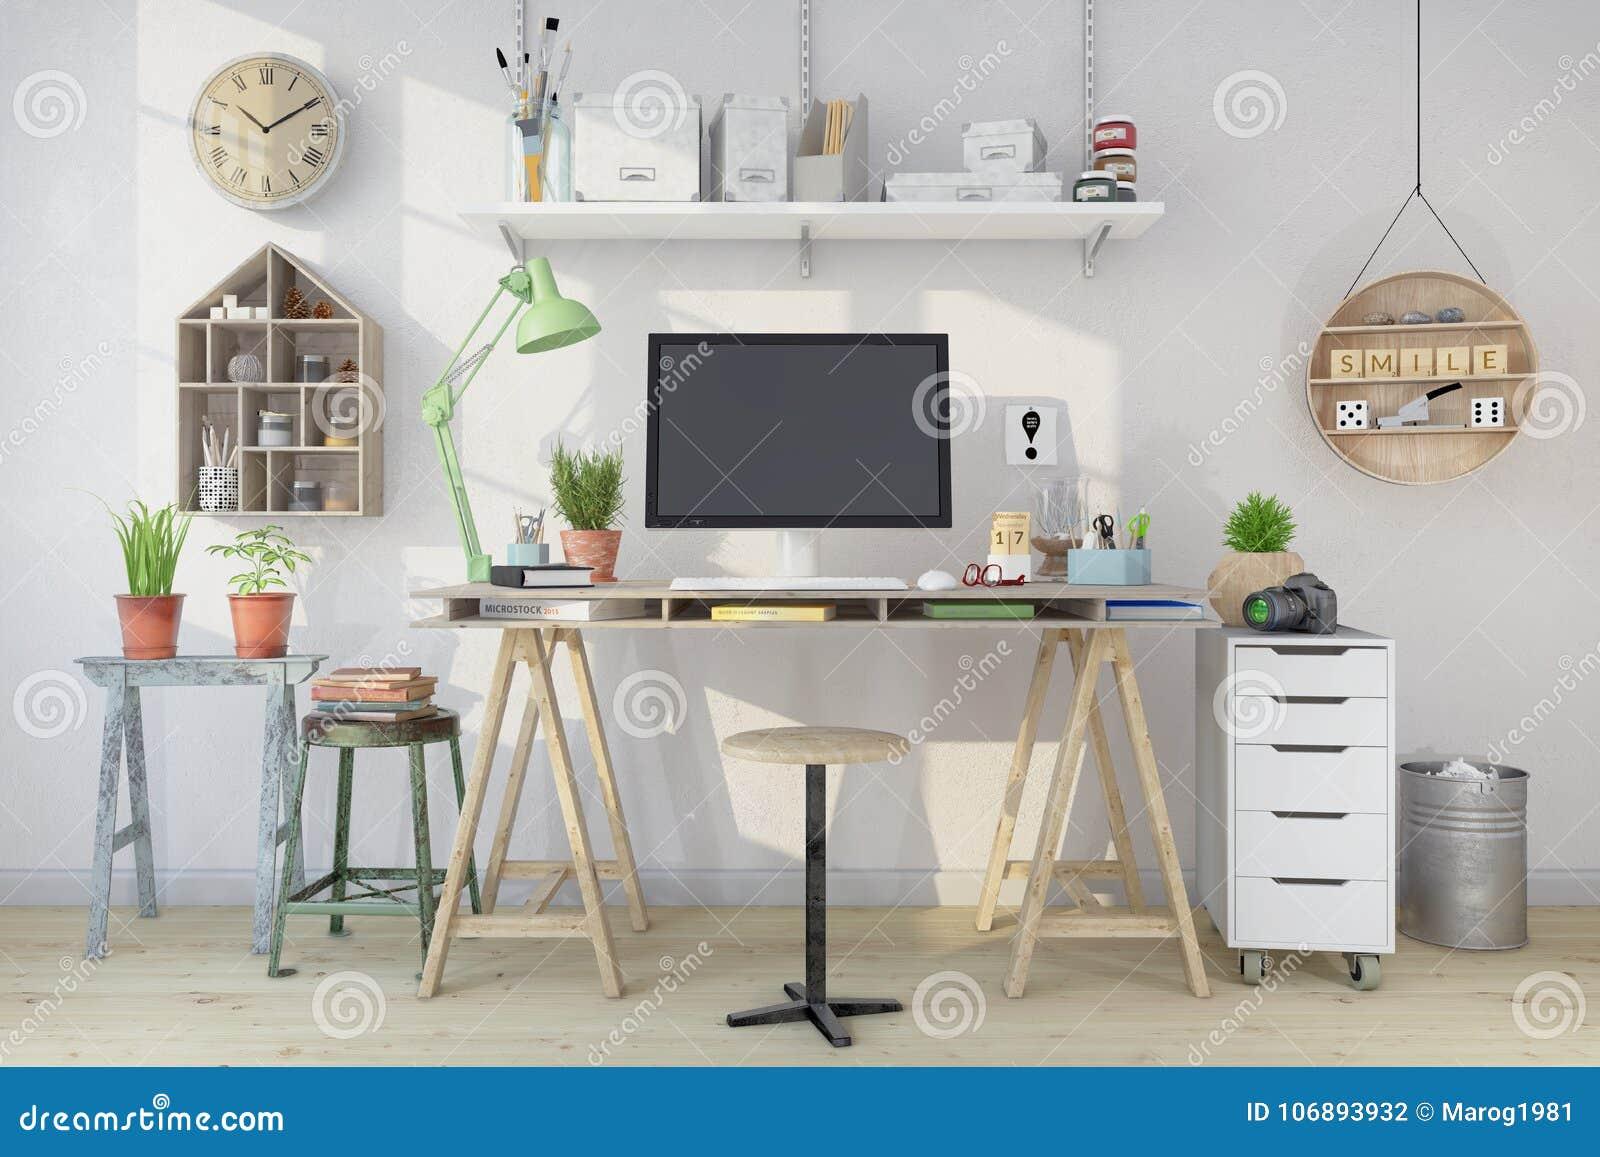 Download 3d Render   Scandinavian Nordic Home Office Stock Illustration    Illustration Of Office, Finland